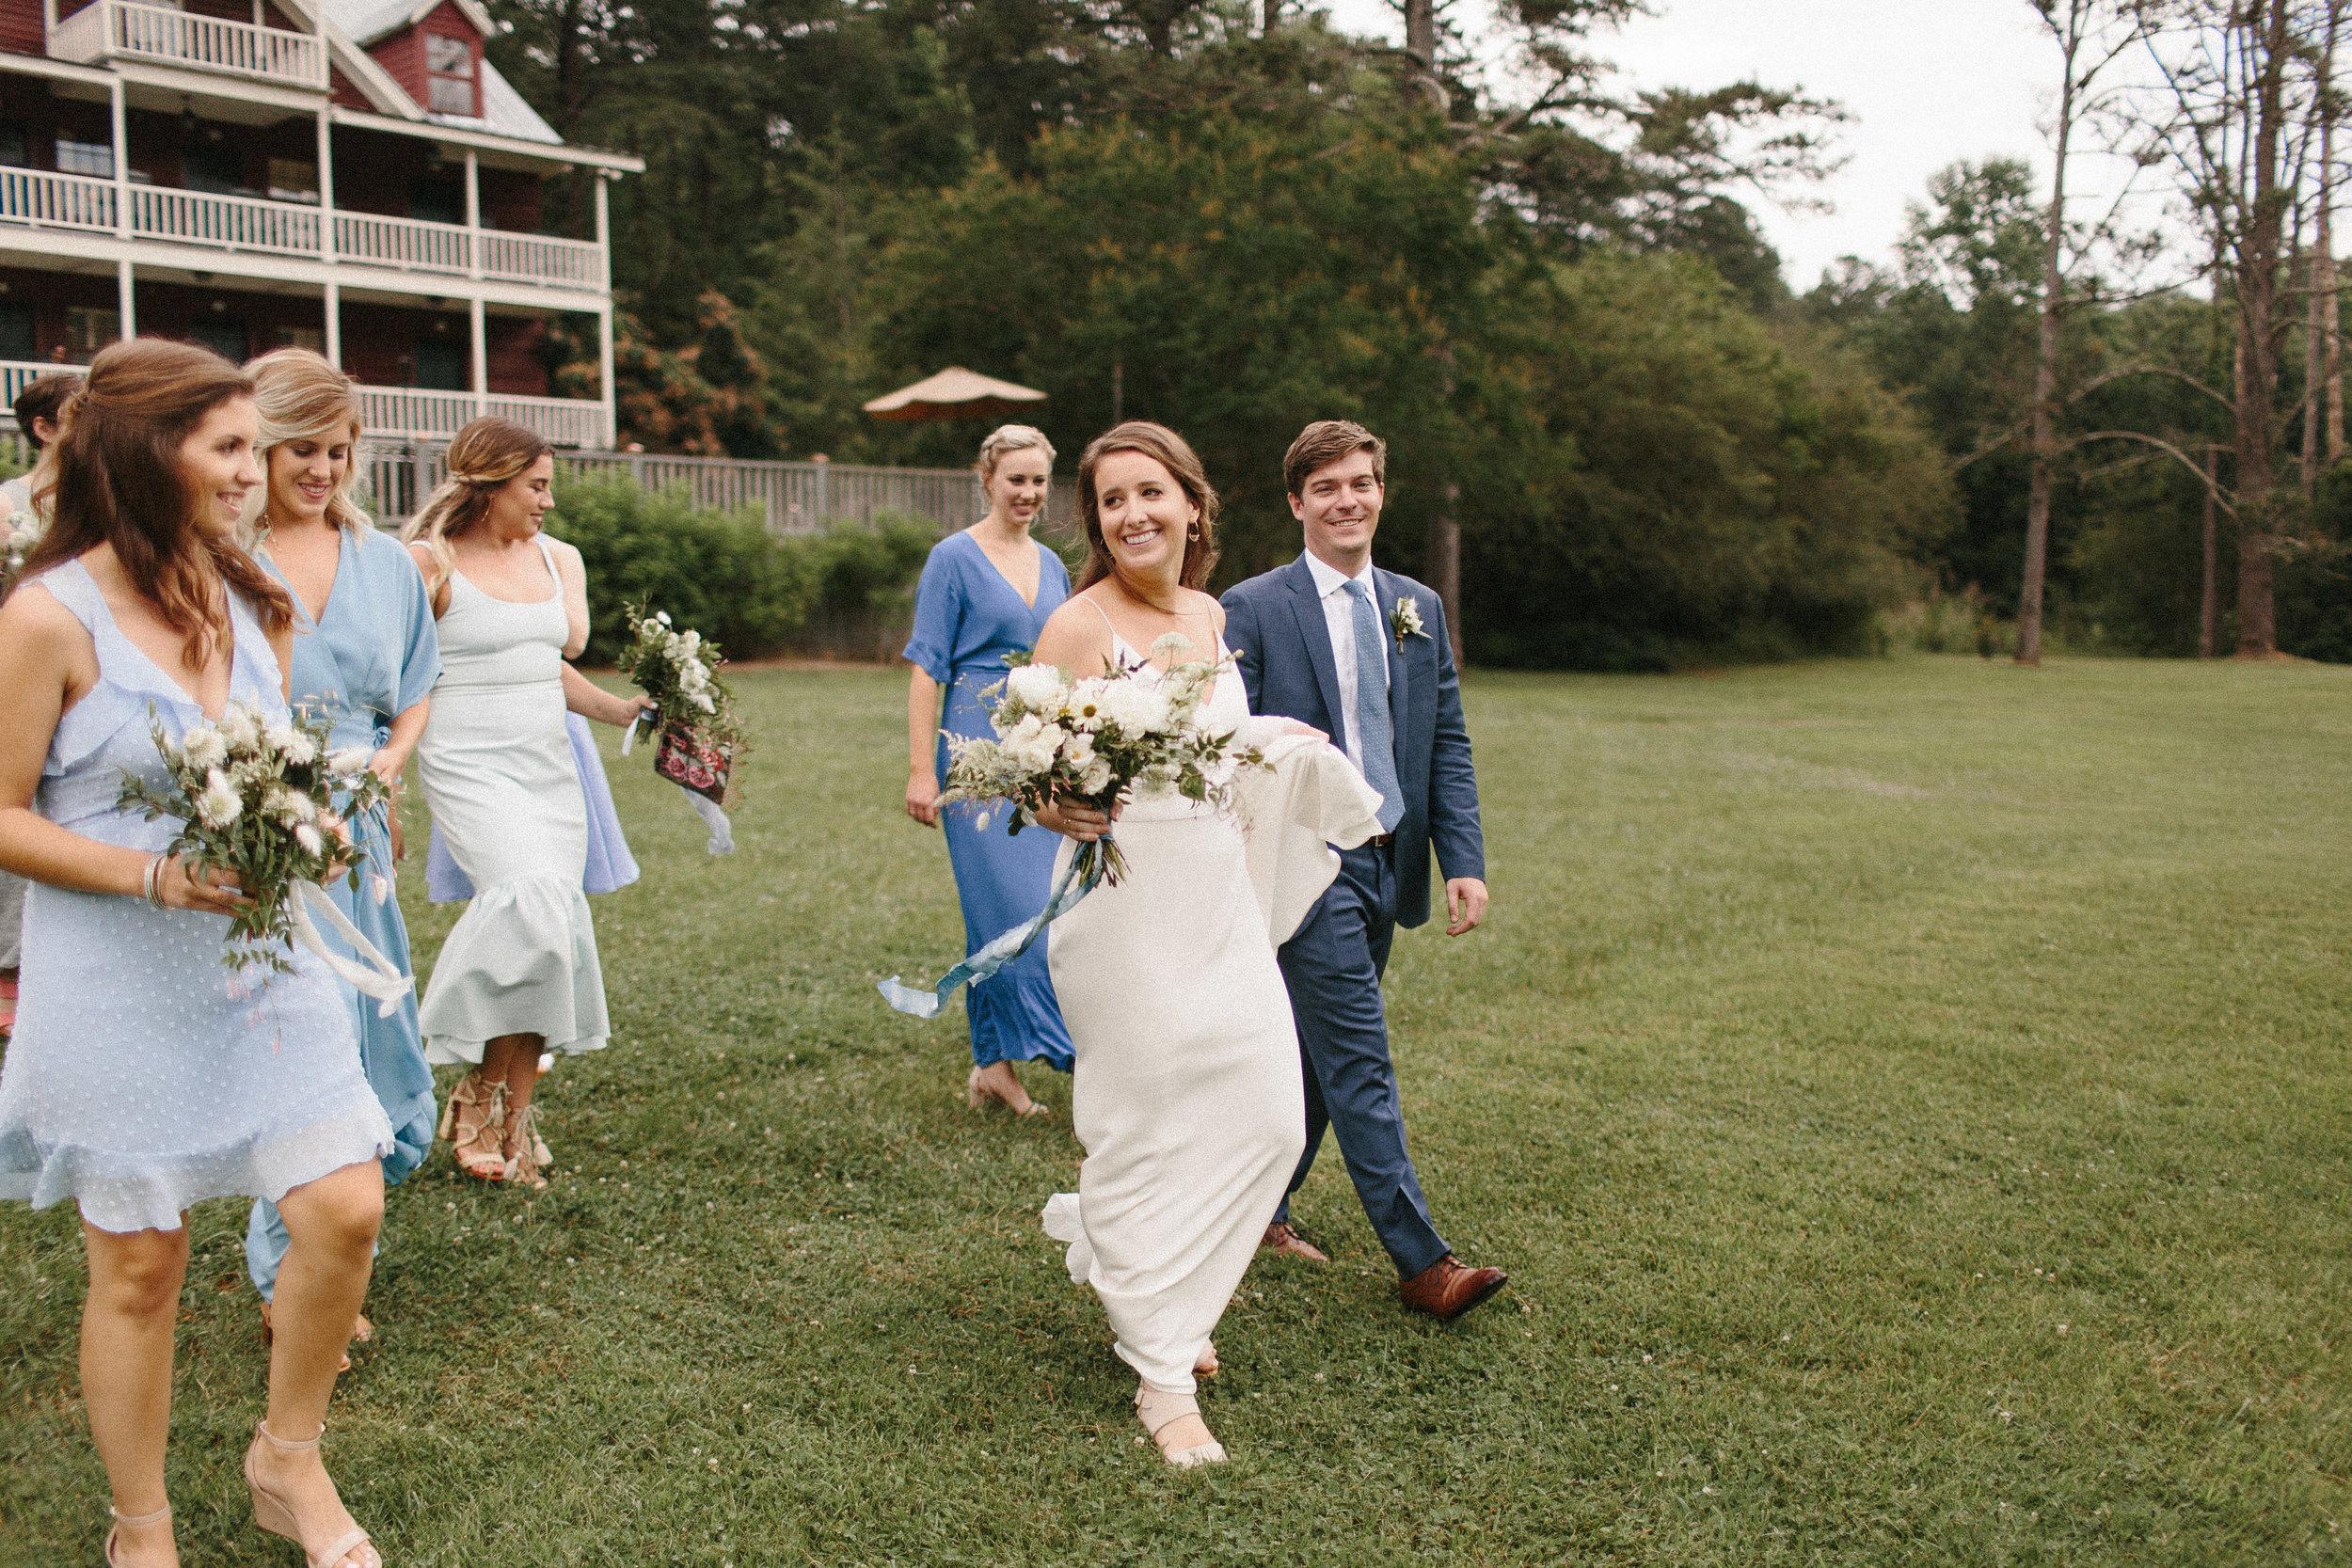 glen_ella_meadow_creekside_atlanta_wedding_photographers_1567.jpg